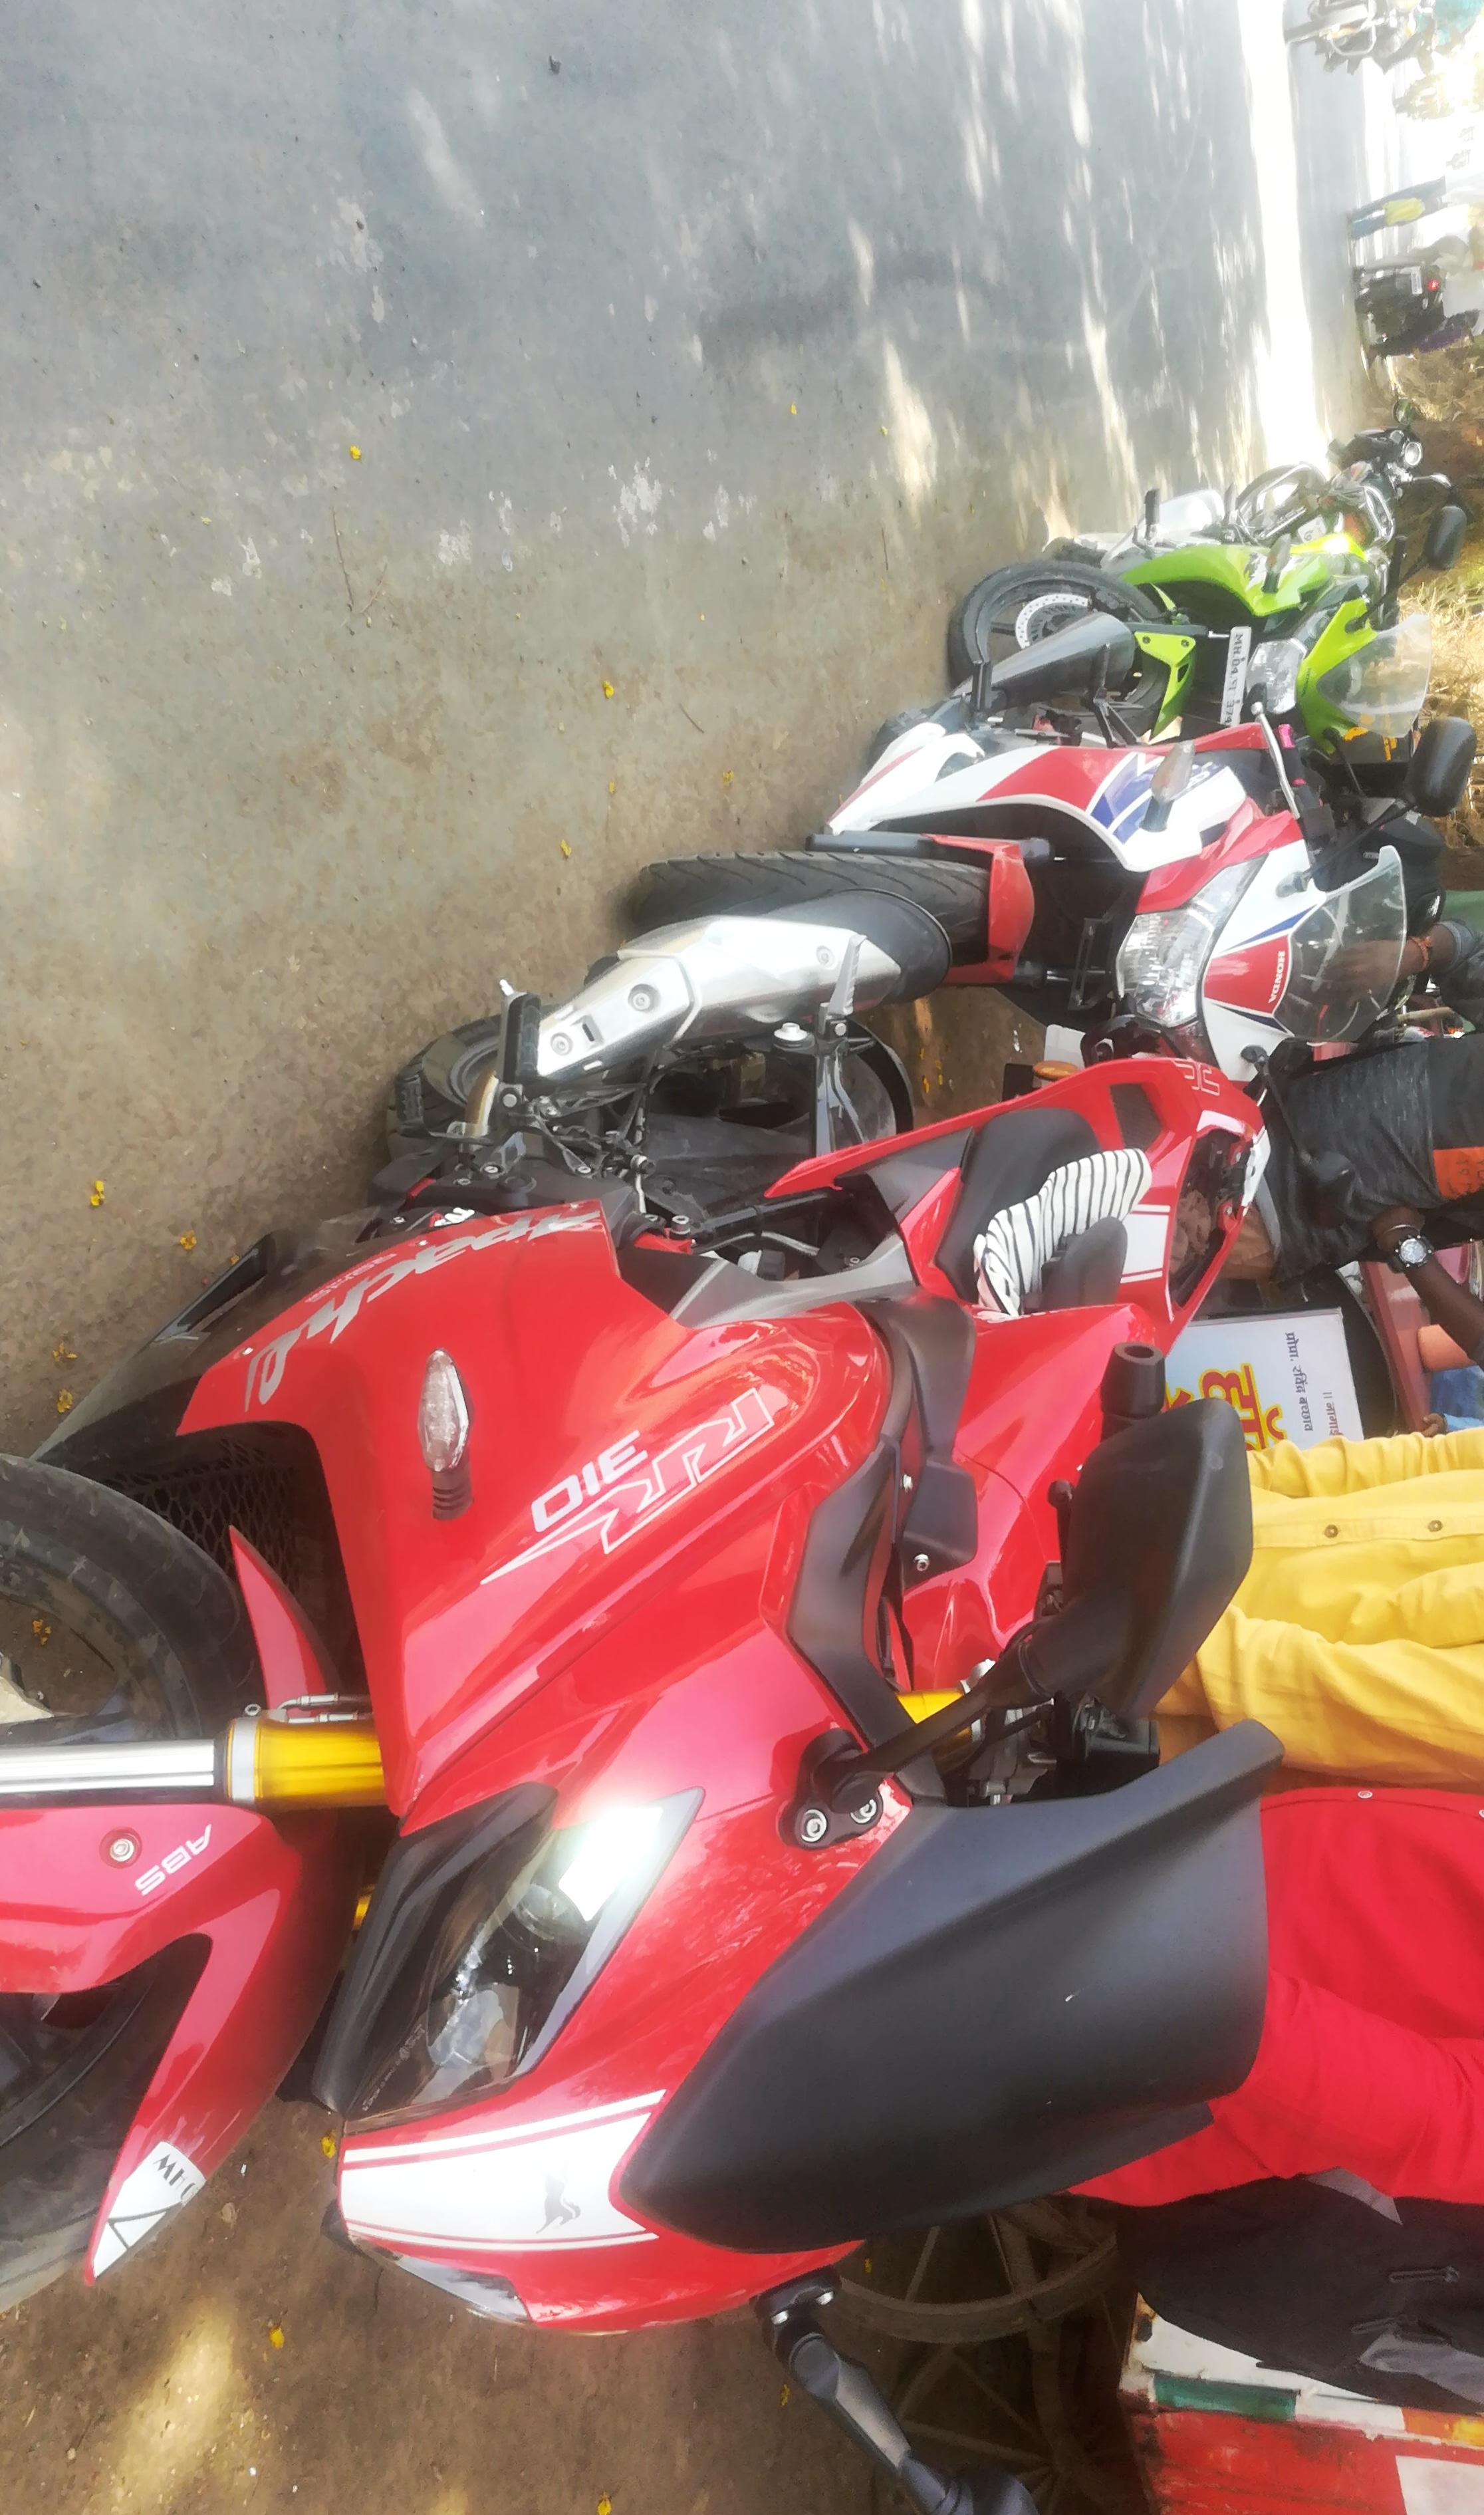 Ride image by Fayaz Jamadar